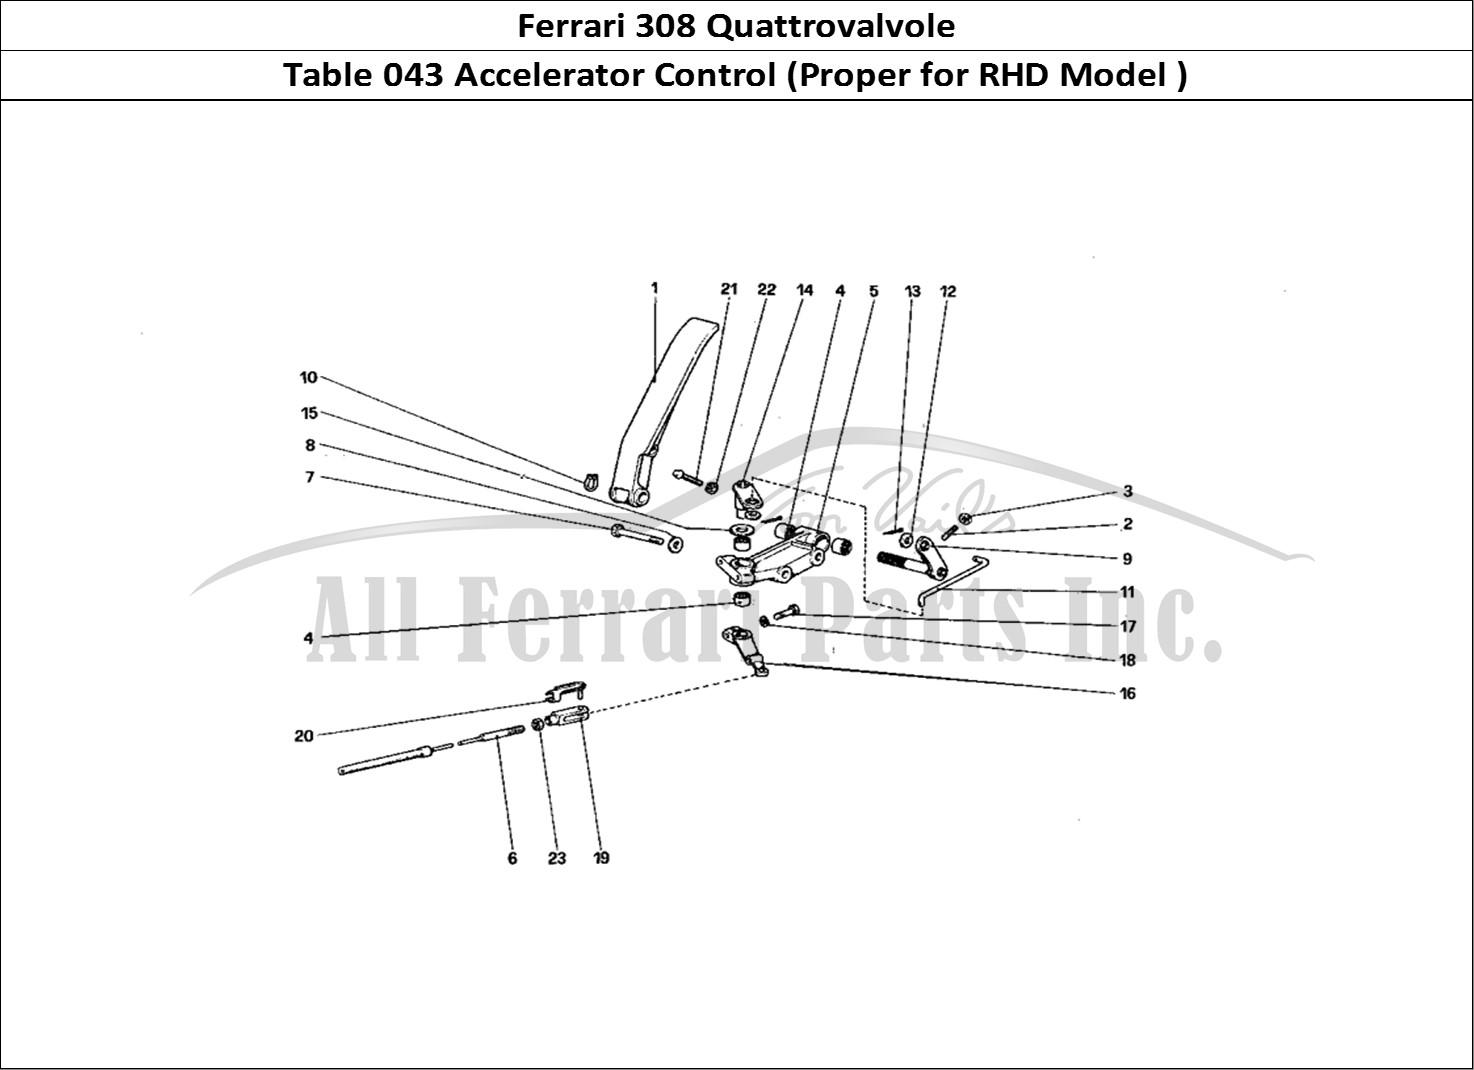 Buy original Ferrari 308 Quattrovalvole 043 Accelerator